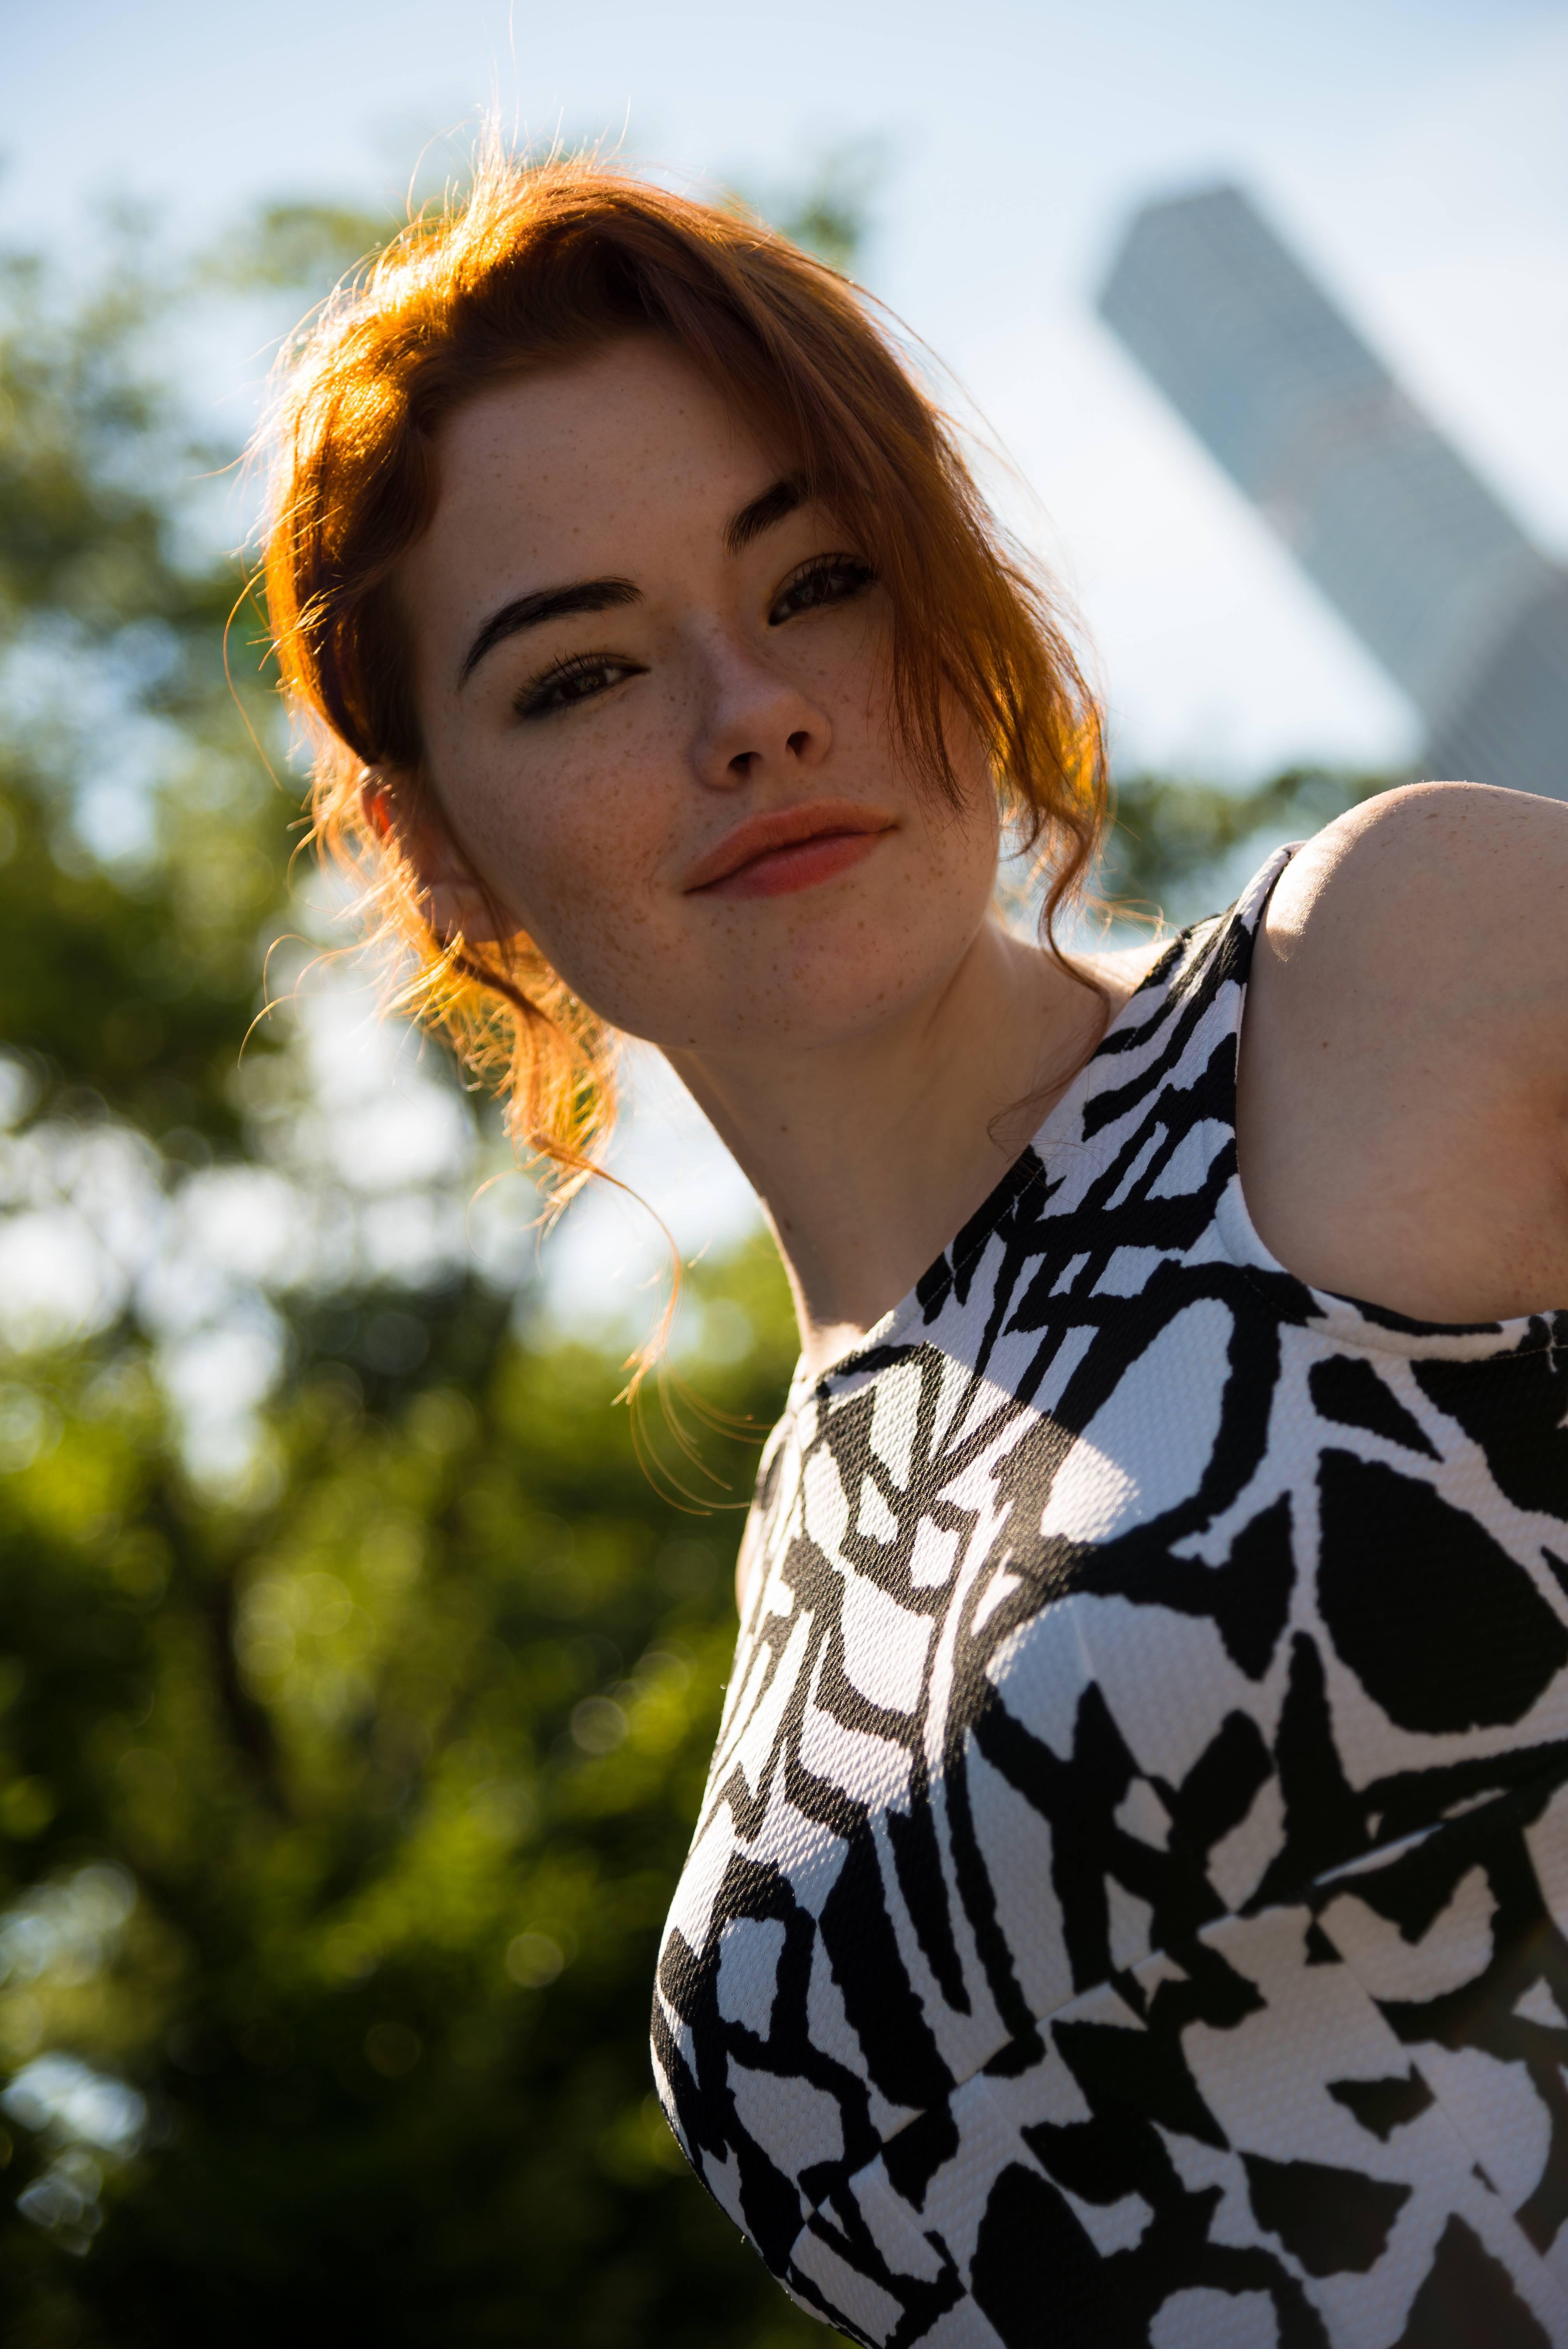 People 4016x6016 women outdoors redhead model portrait display Sabrina Lynn freckles depth of field face